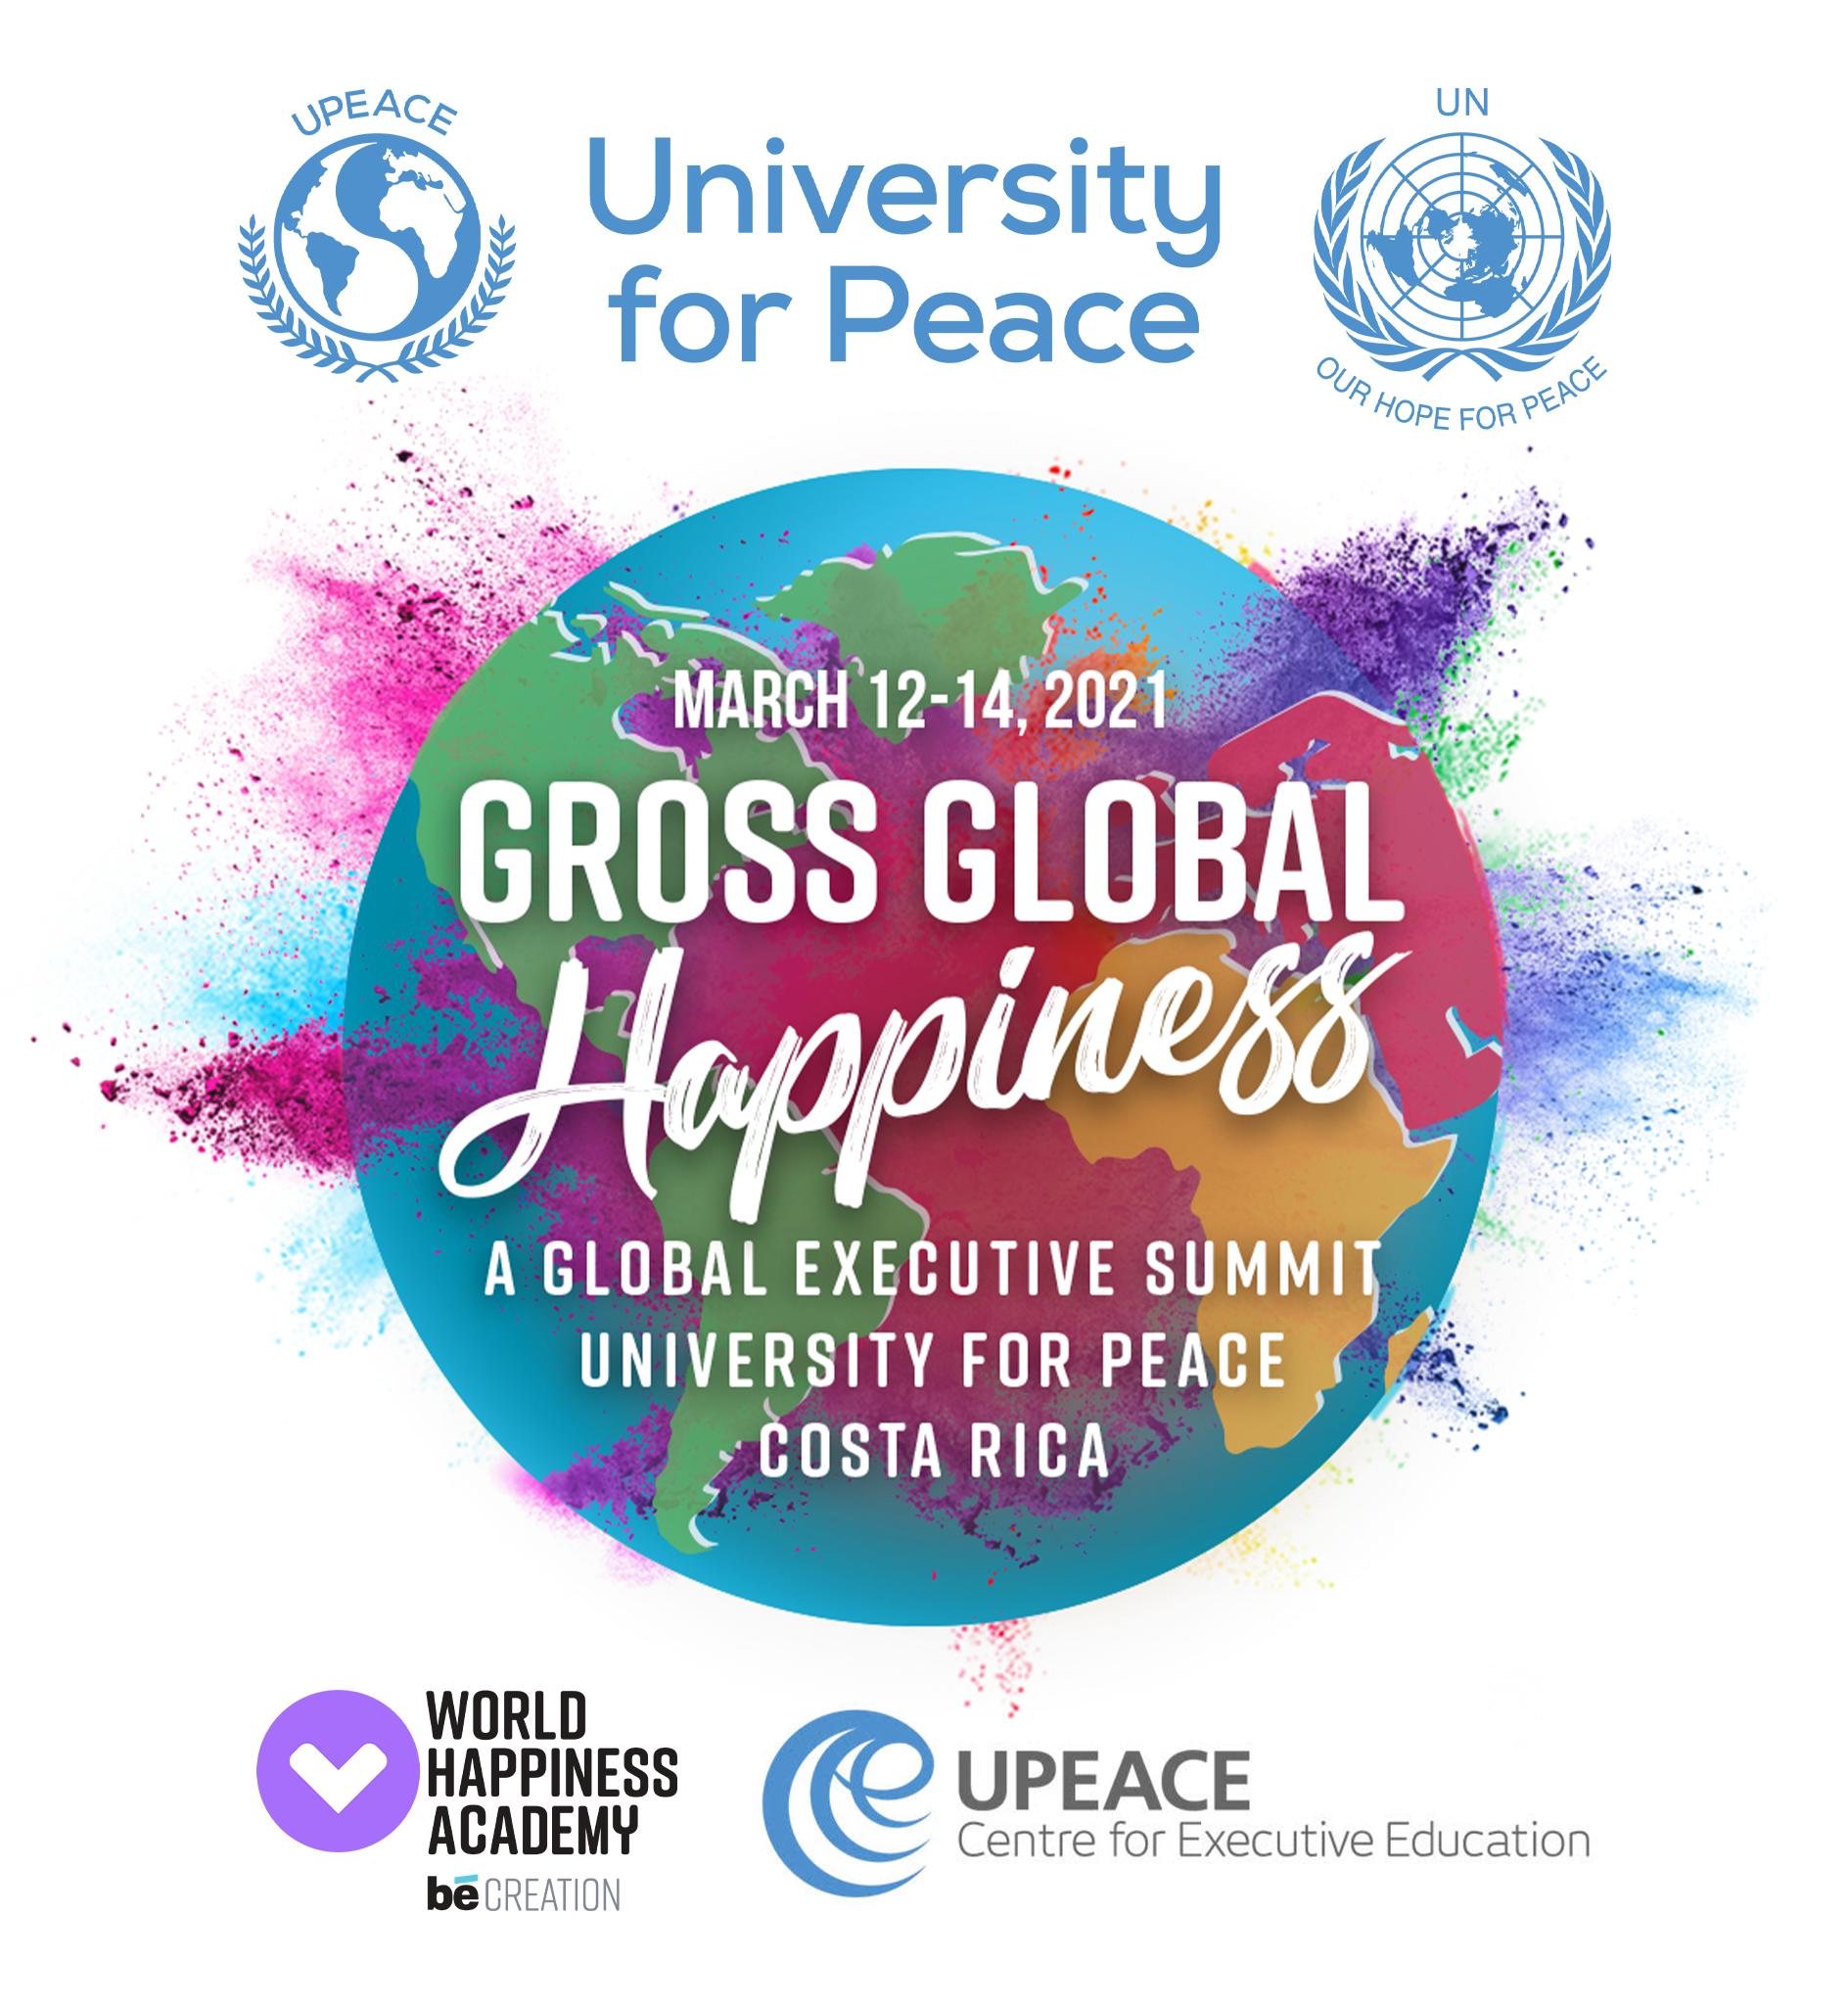 Gross Global Happiness